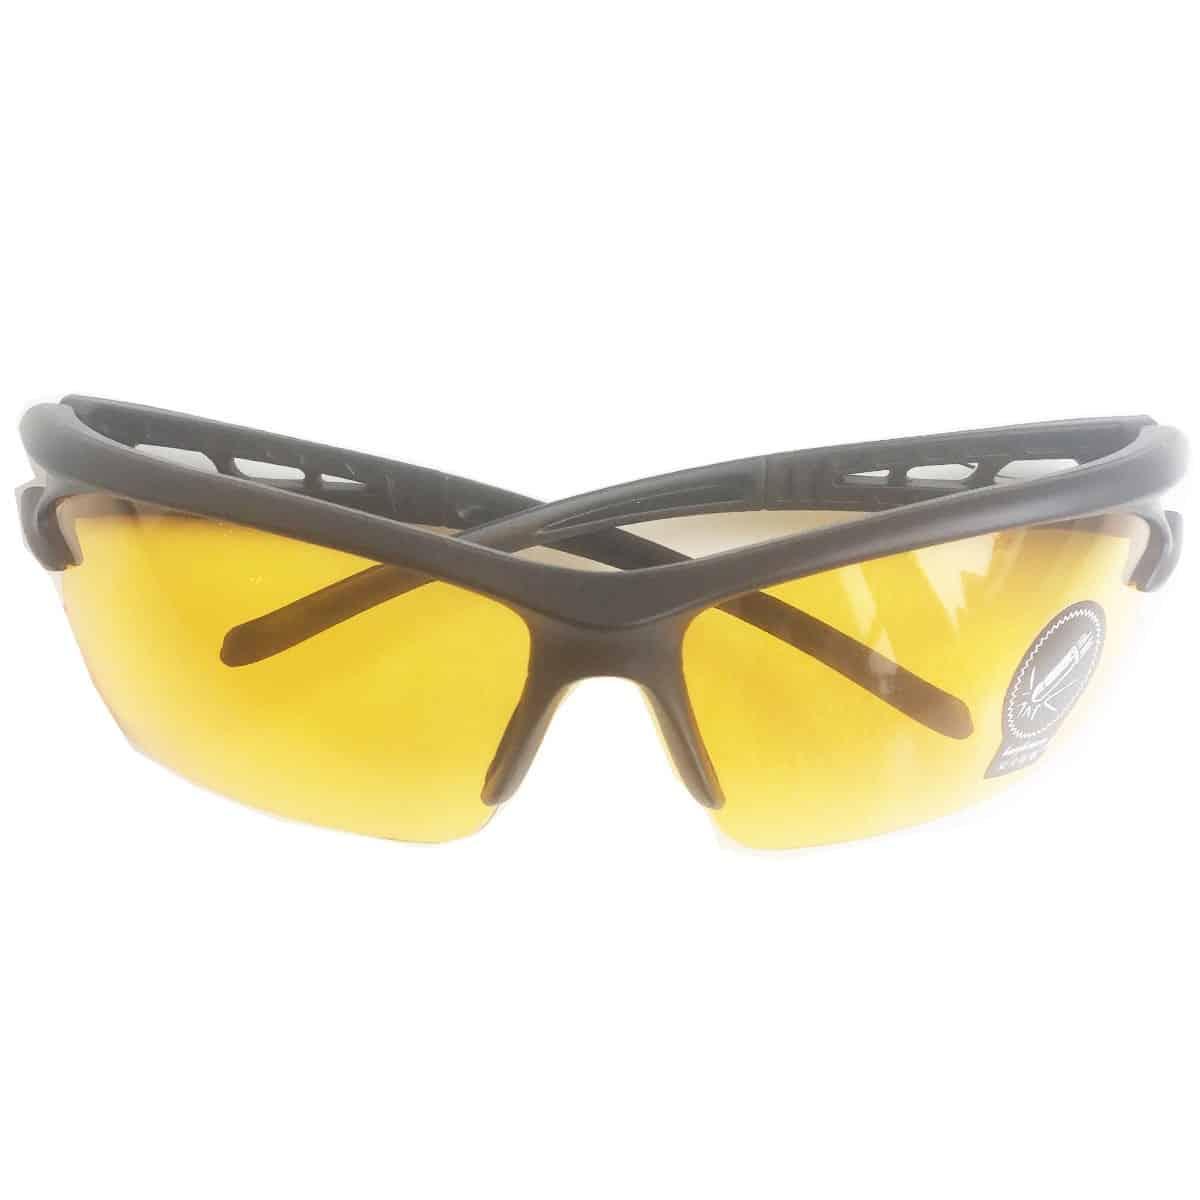 e4280c84b19 UV briller